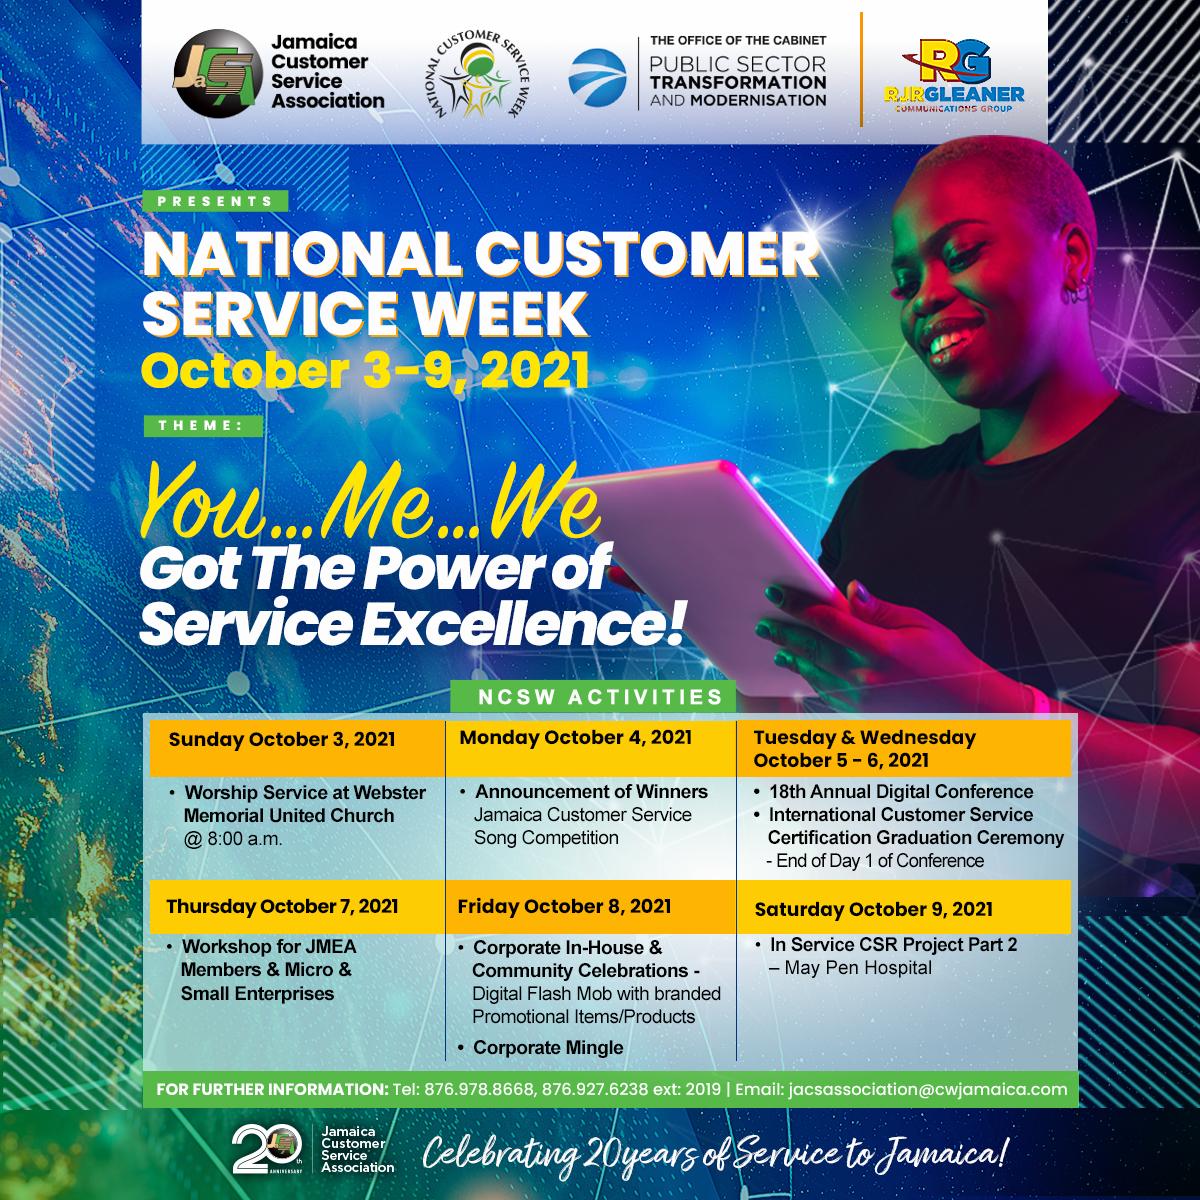 National Customer Service Week 2021